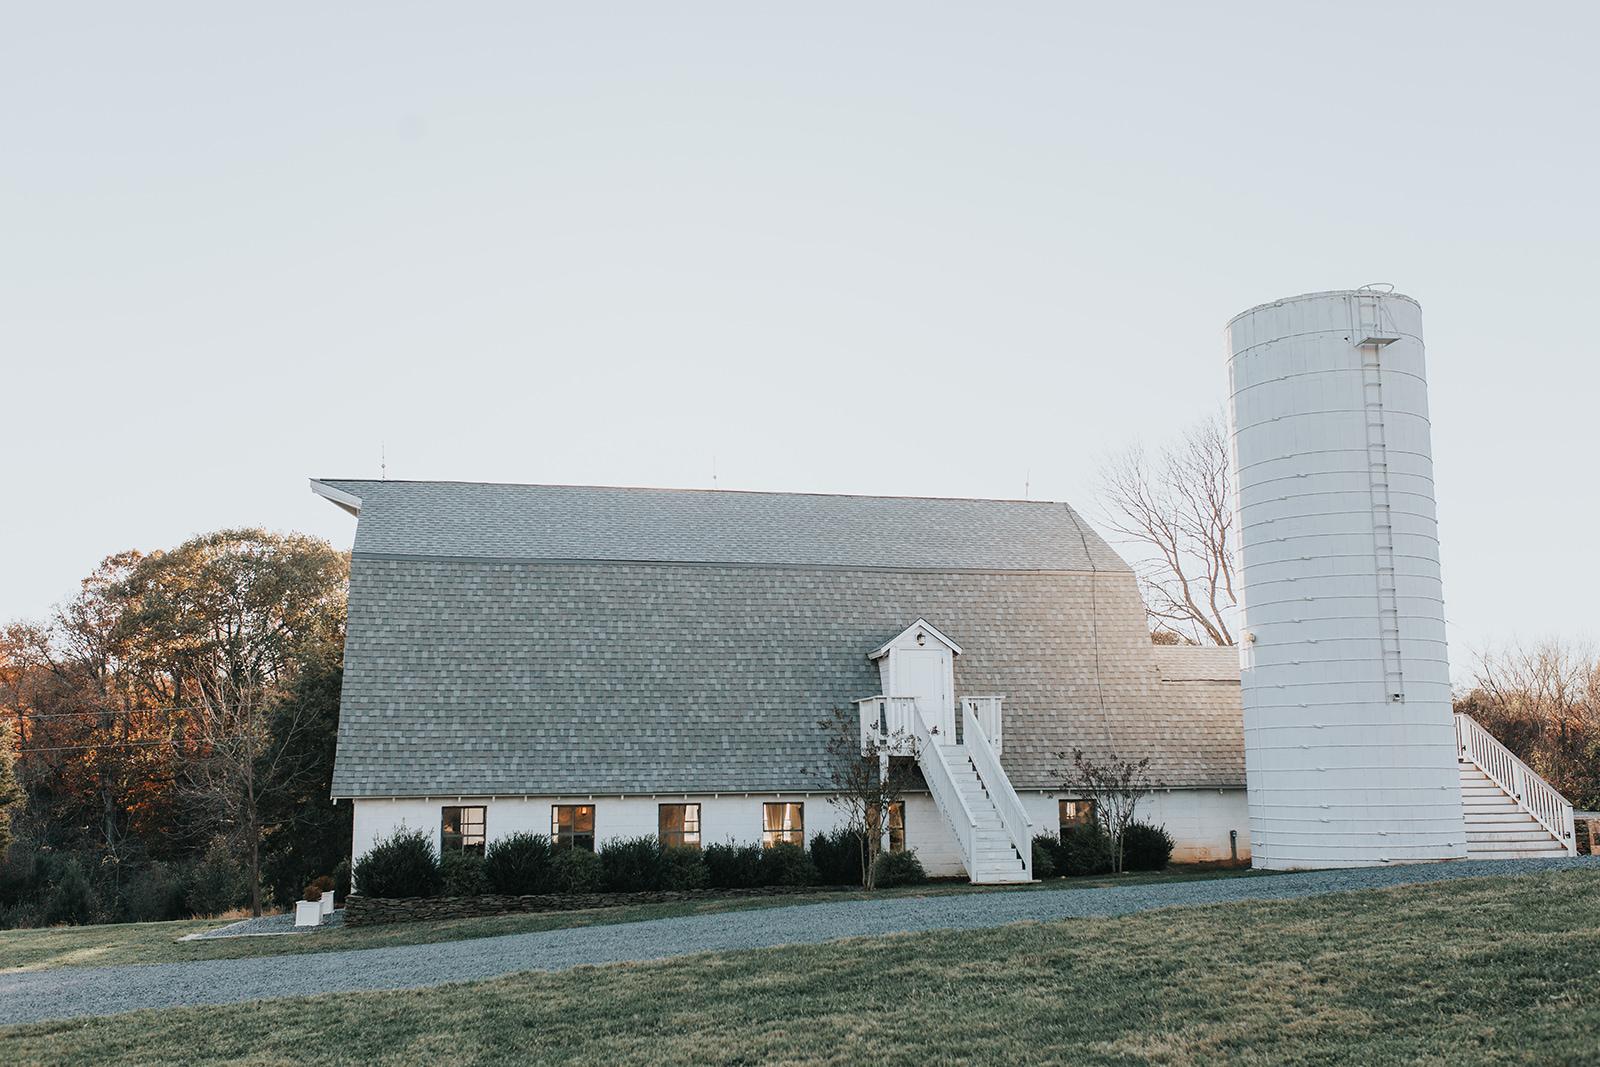 brielle-davis-events-48-fields-wedding-barn-property.jpg